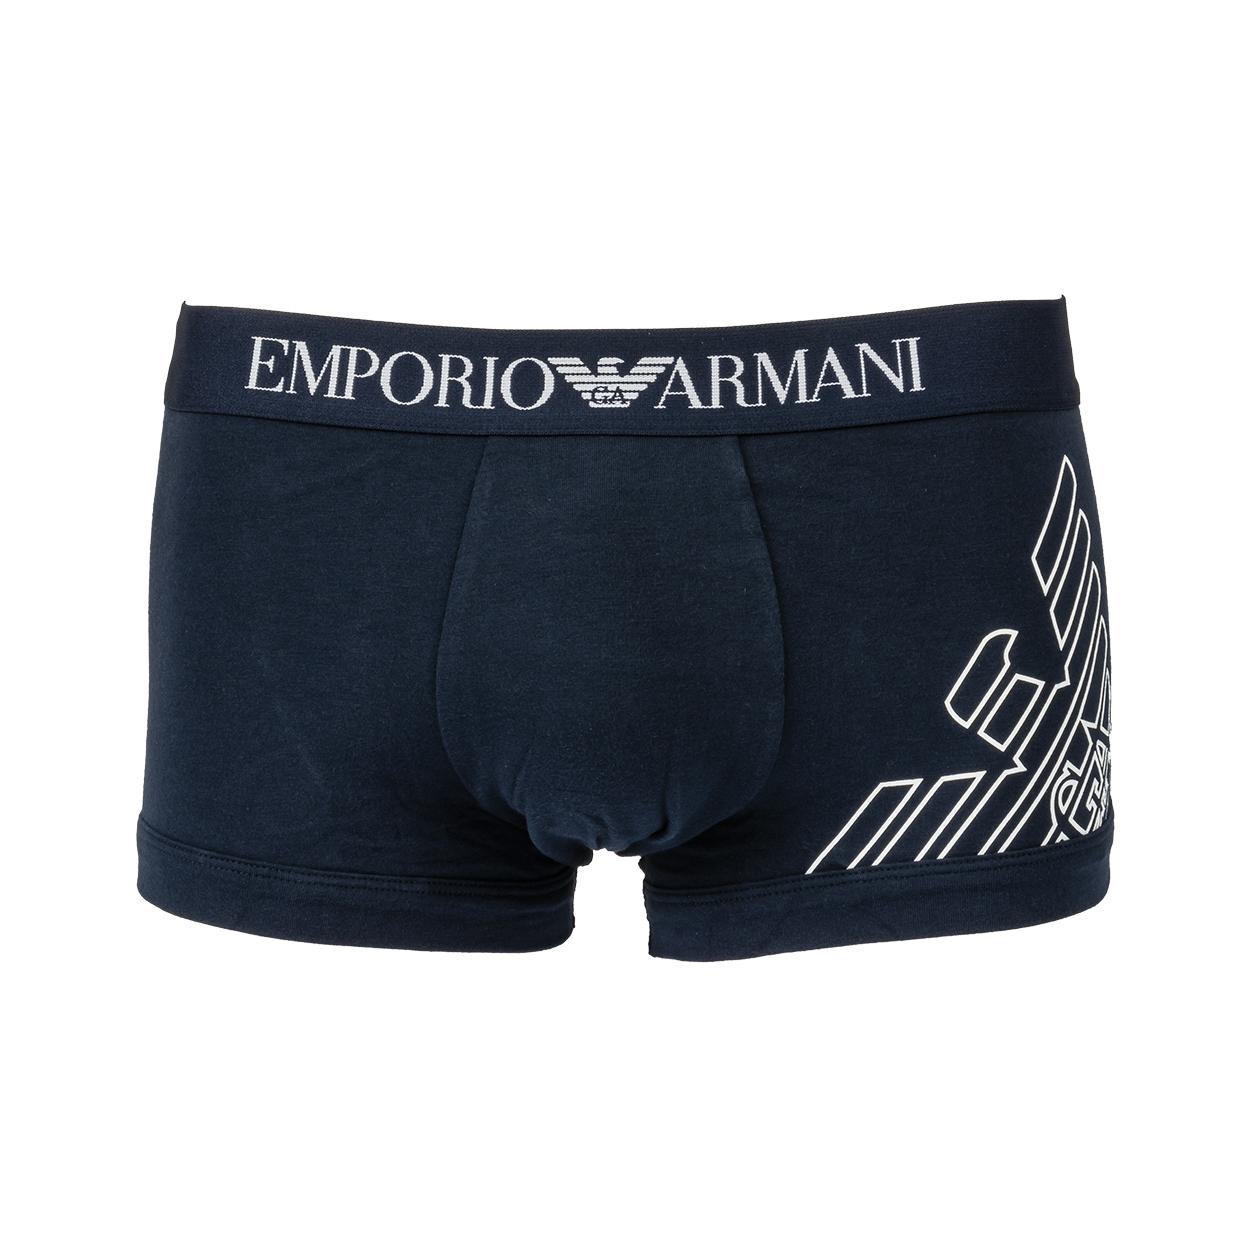 Boxer  en coton stretch bleu marine floqué en blanc